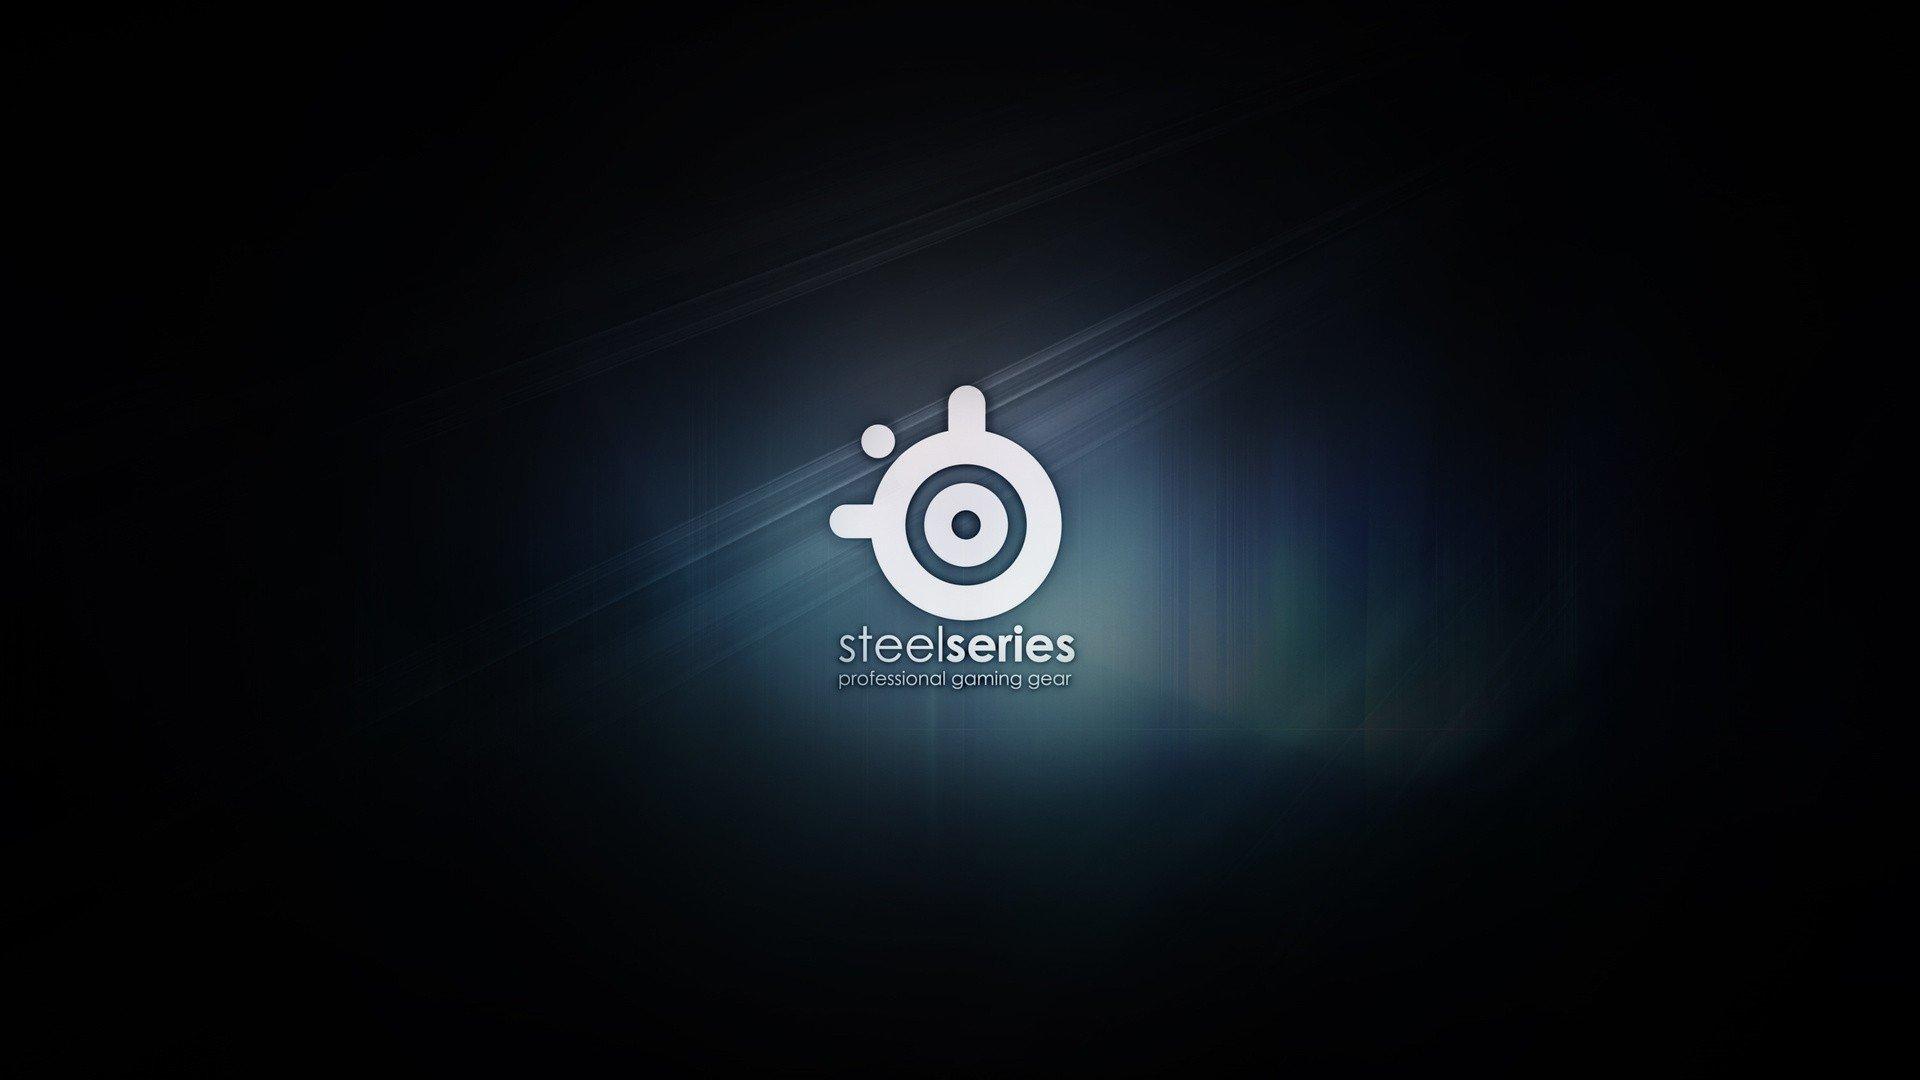 SteelSeries, Logo Wallpaper